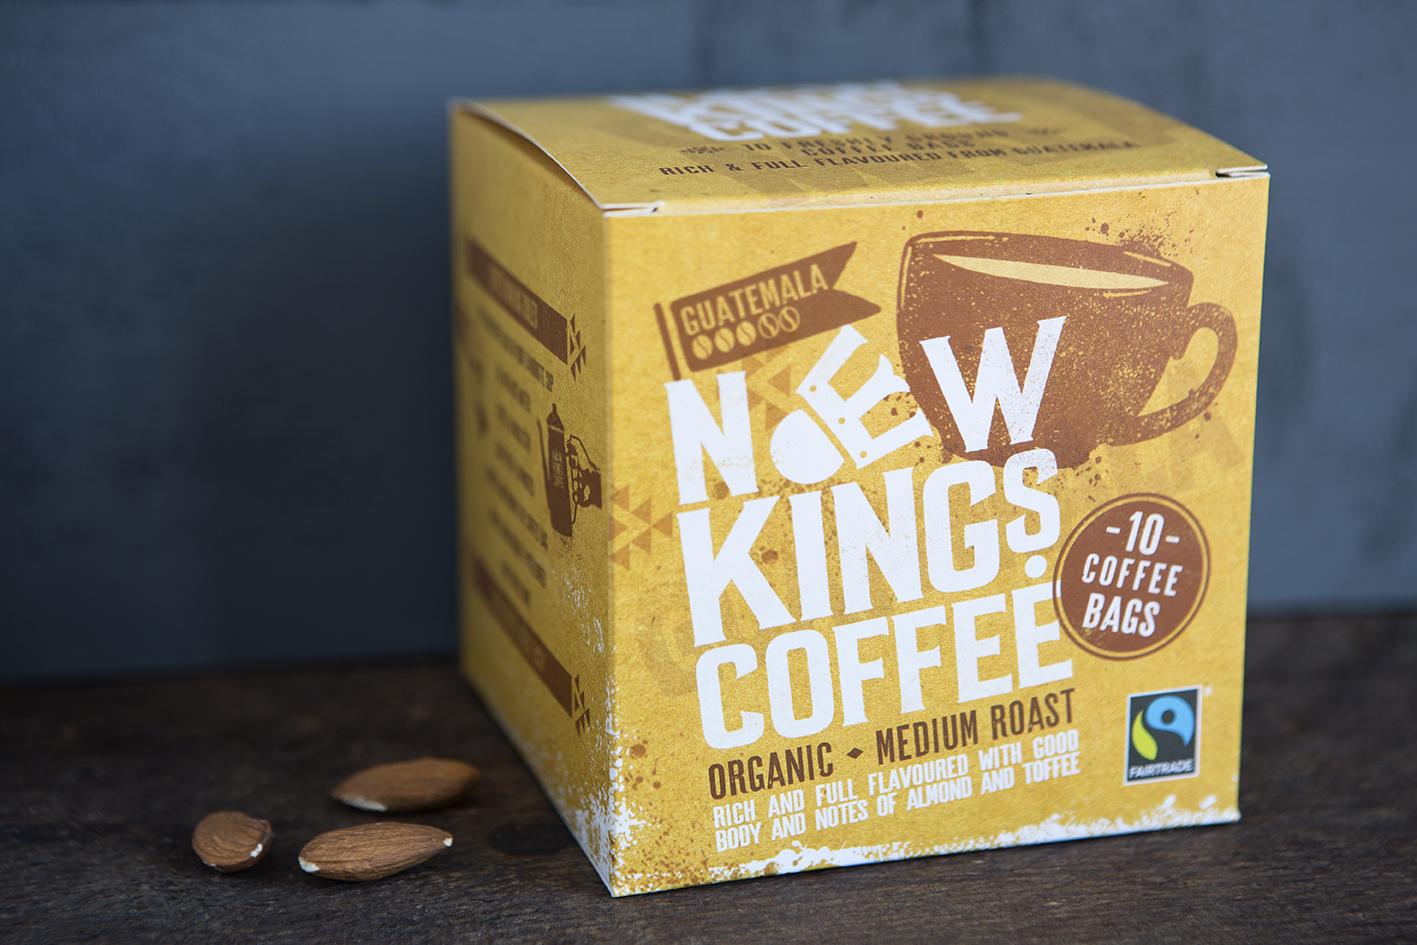 New-Kings-Coffee-Bags-Fairtrade-Organic-Medium-Roast-10.jpg